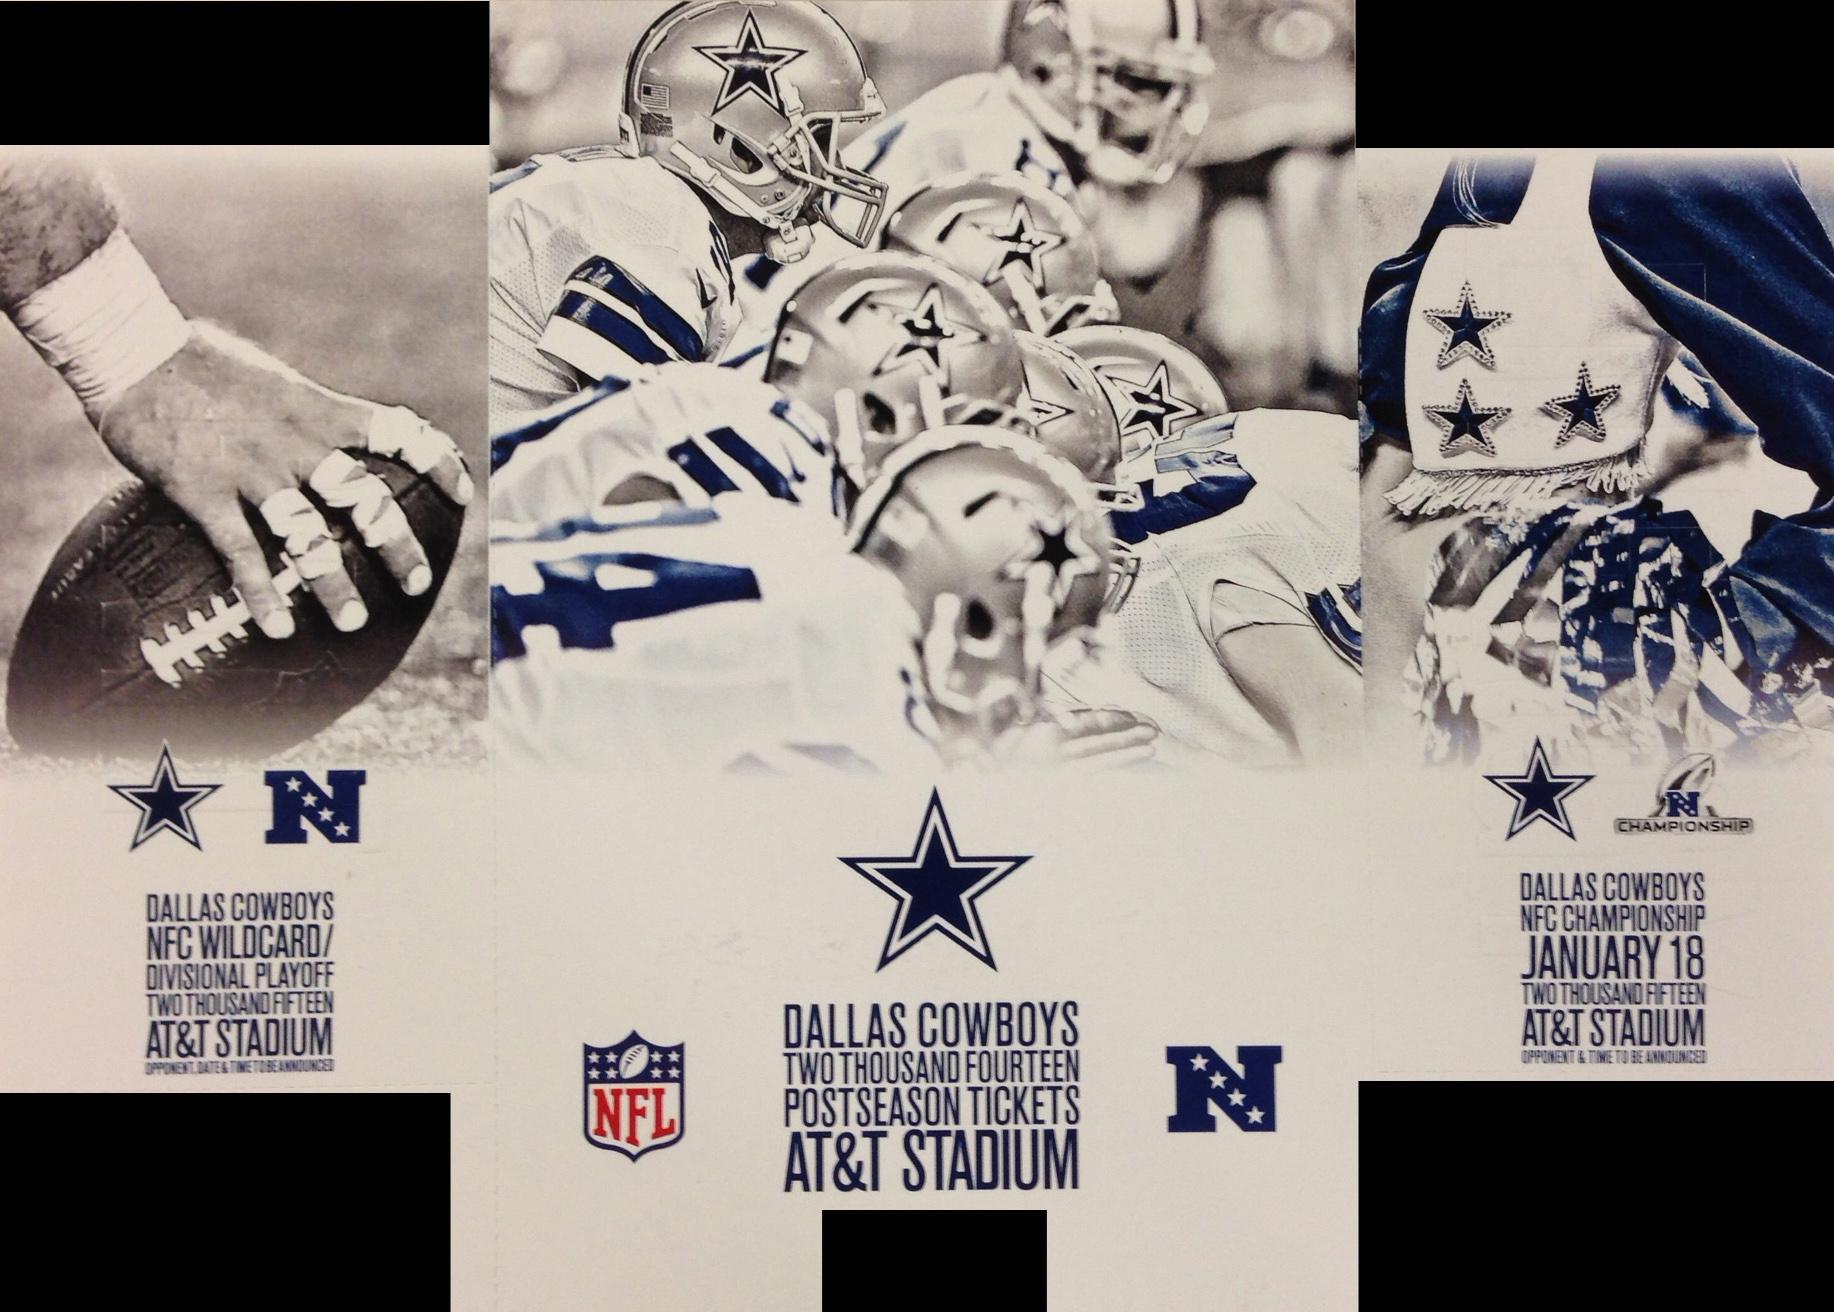 fb3401e5a Dallas Cowboys  After playoff season